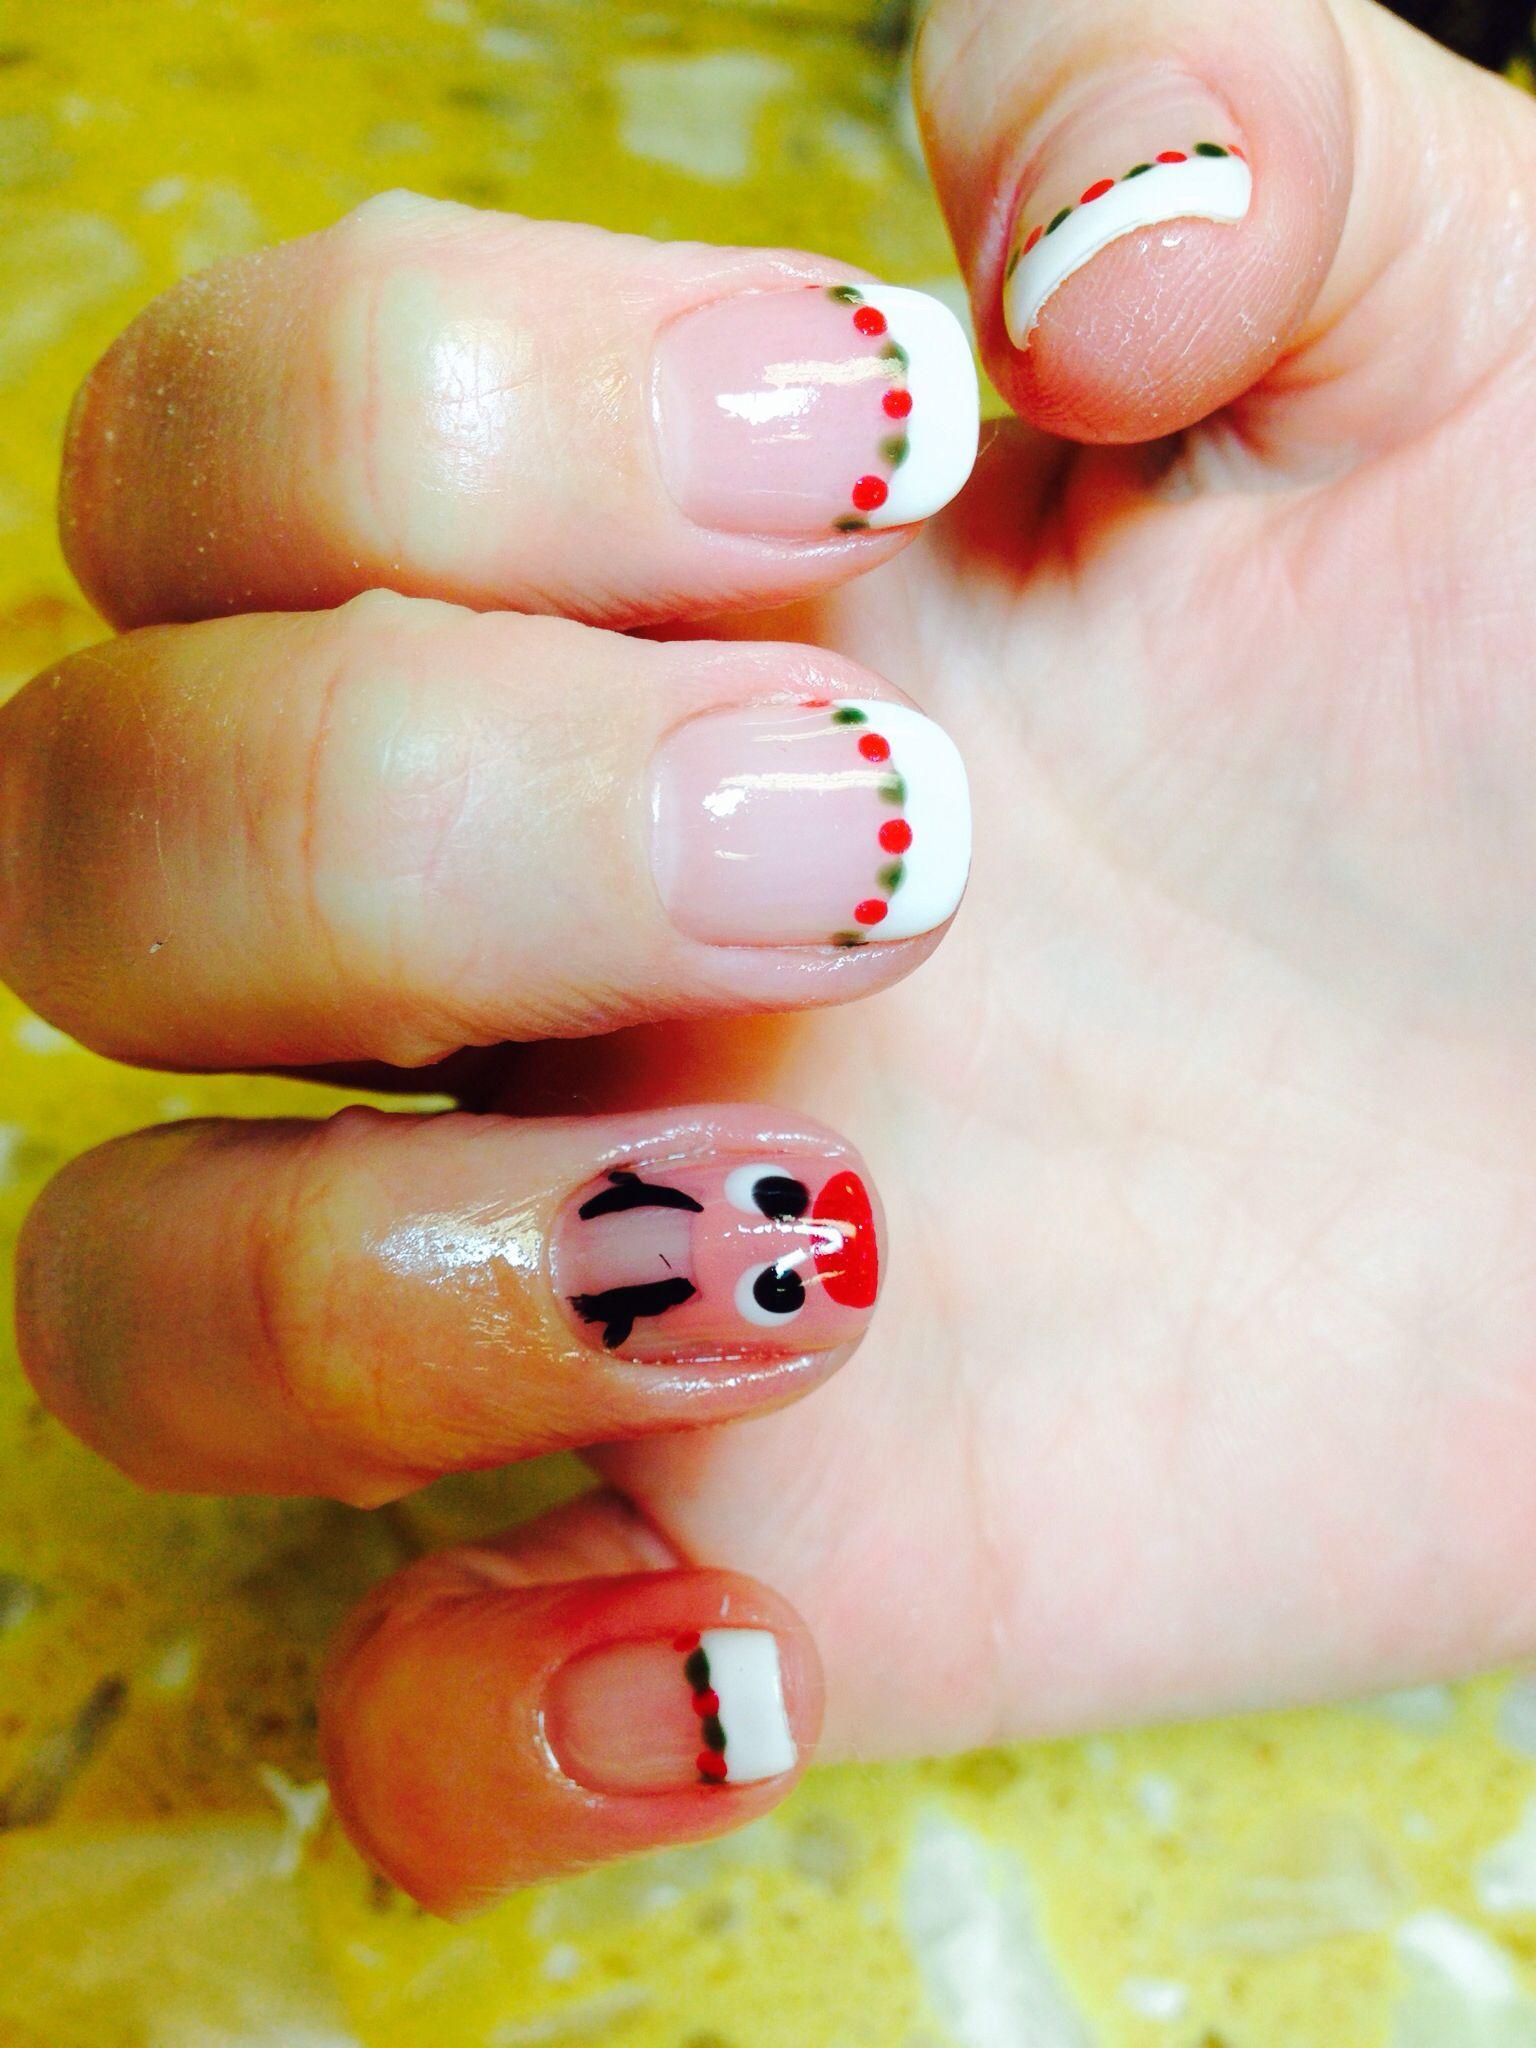 Christmas nails art#gel polish design @ Ocean Nails & Spa, FWB, FL ...